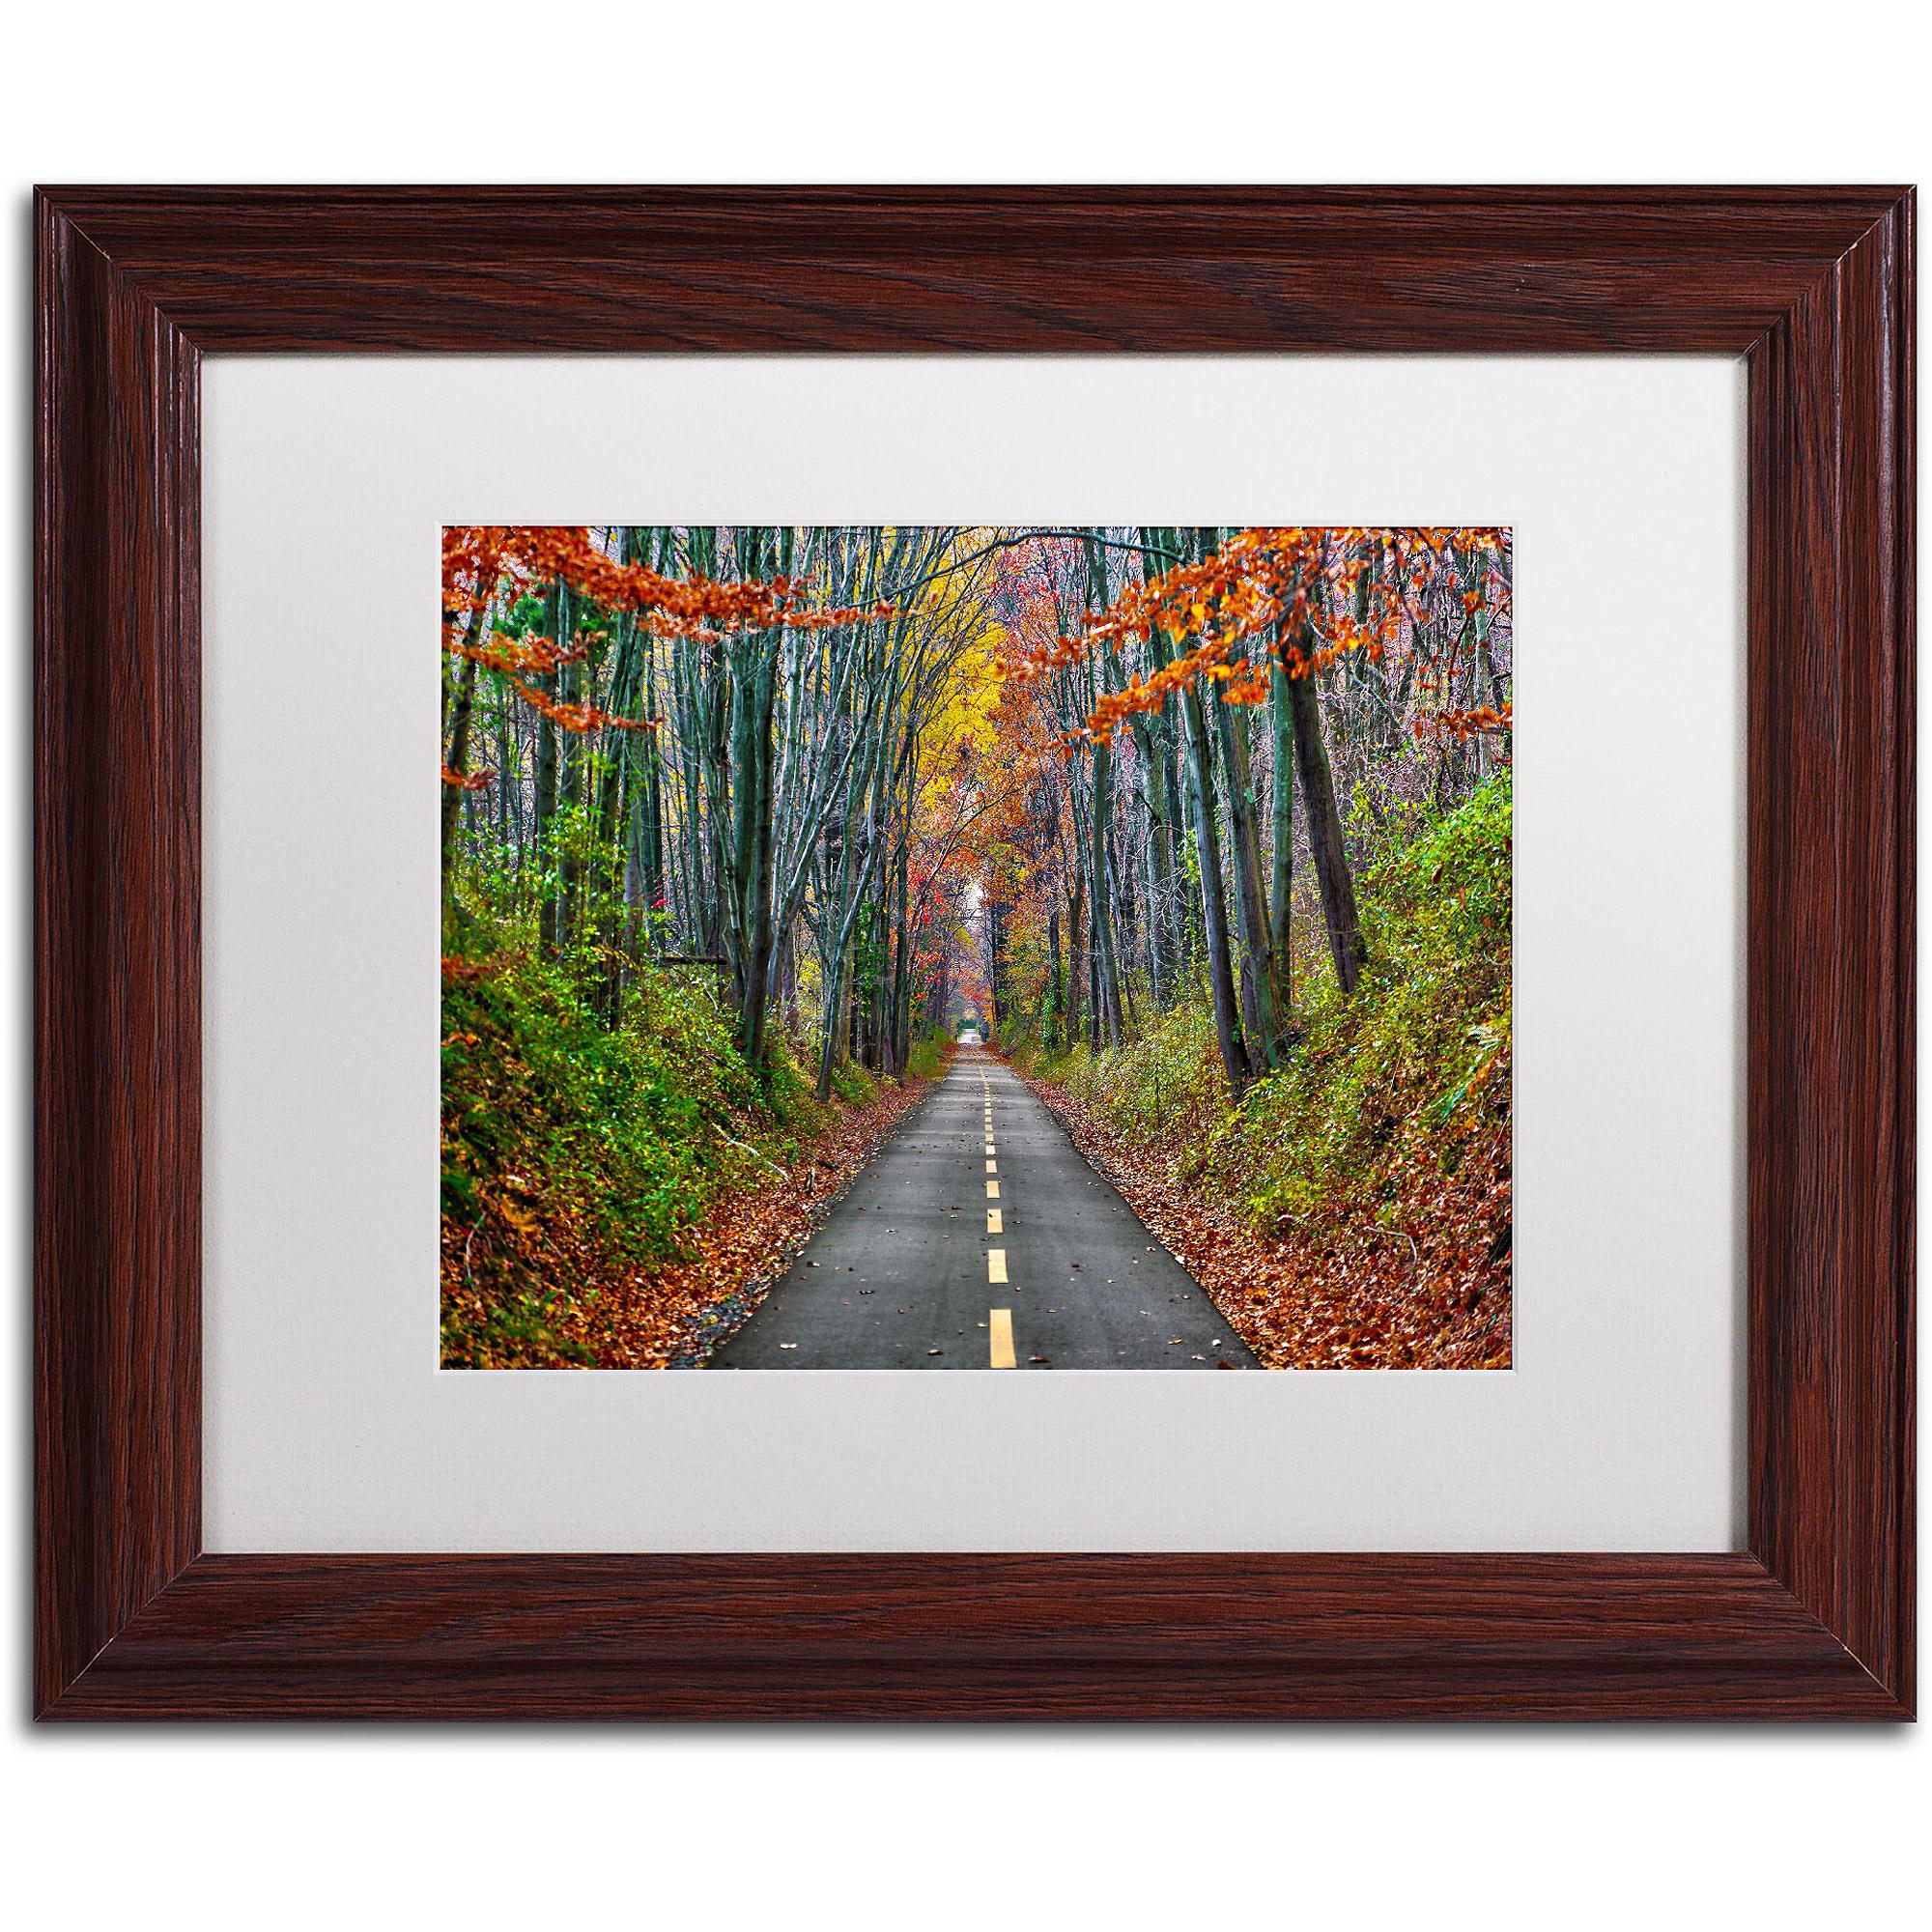 "Trademark Fine Art ""Paths"" Canvas Art by CATeyes, White Matte, Wood Frame"